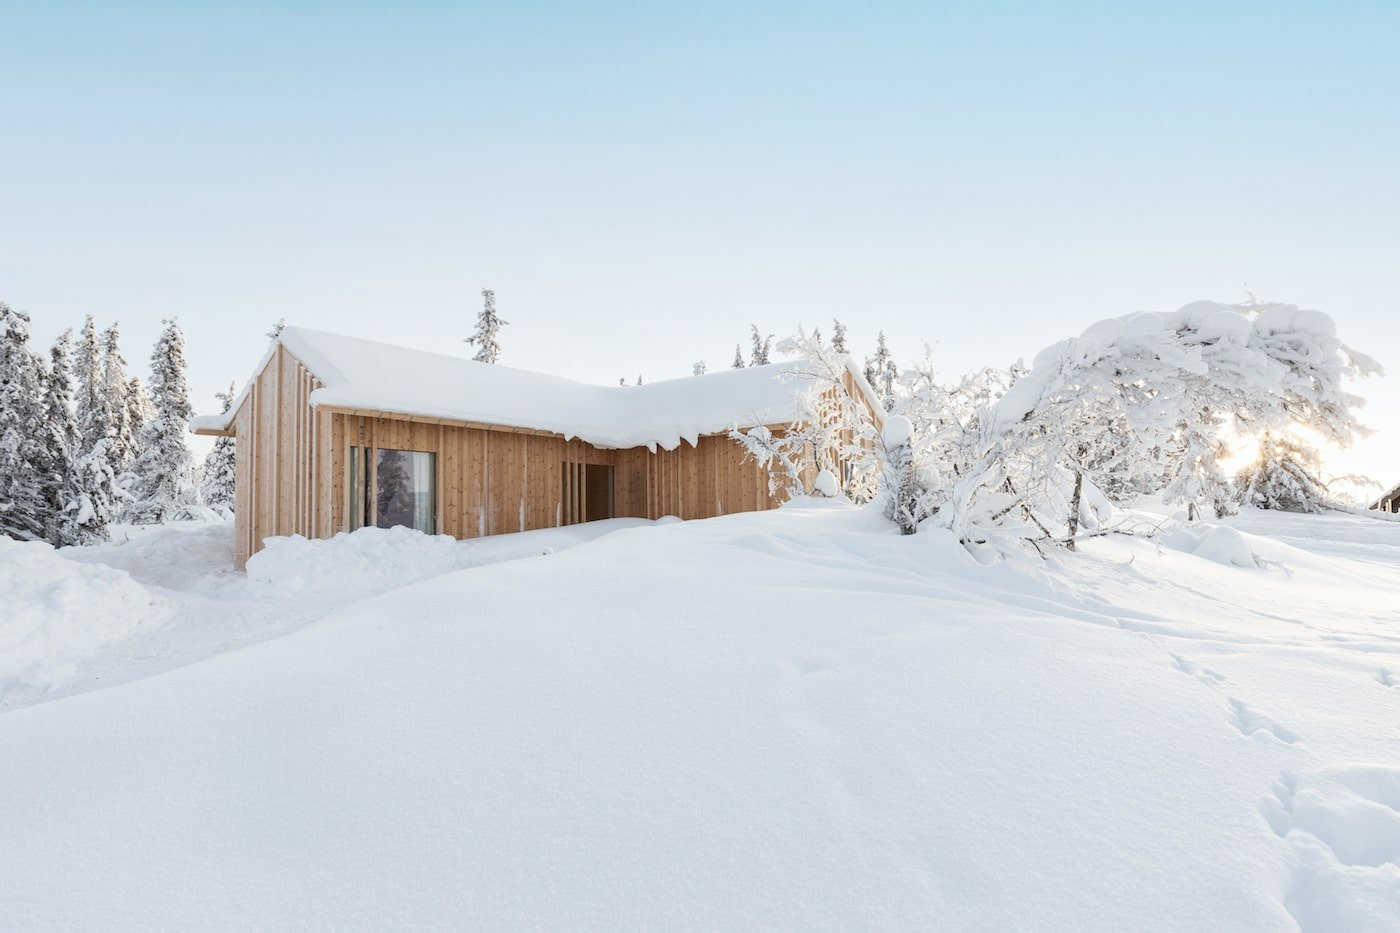 Timber clad exterior of Kvitfjell Cabin